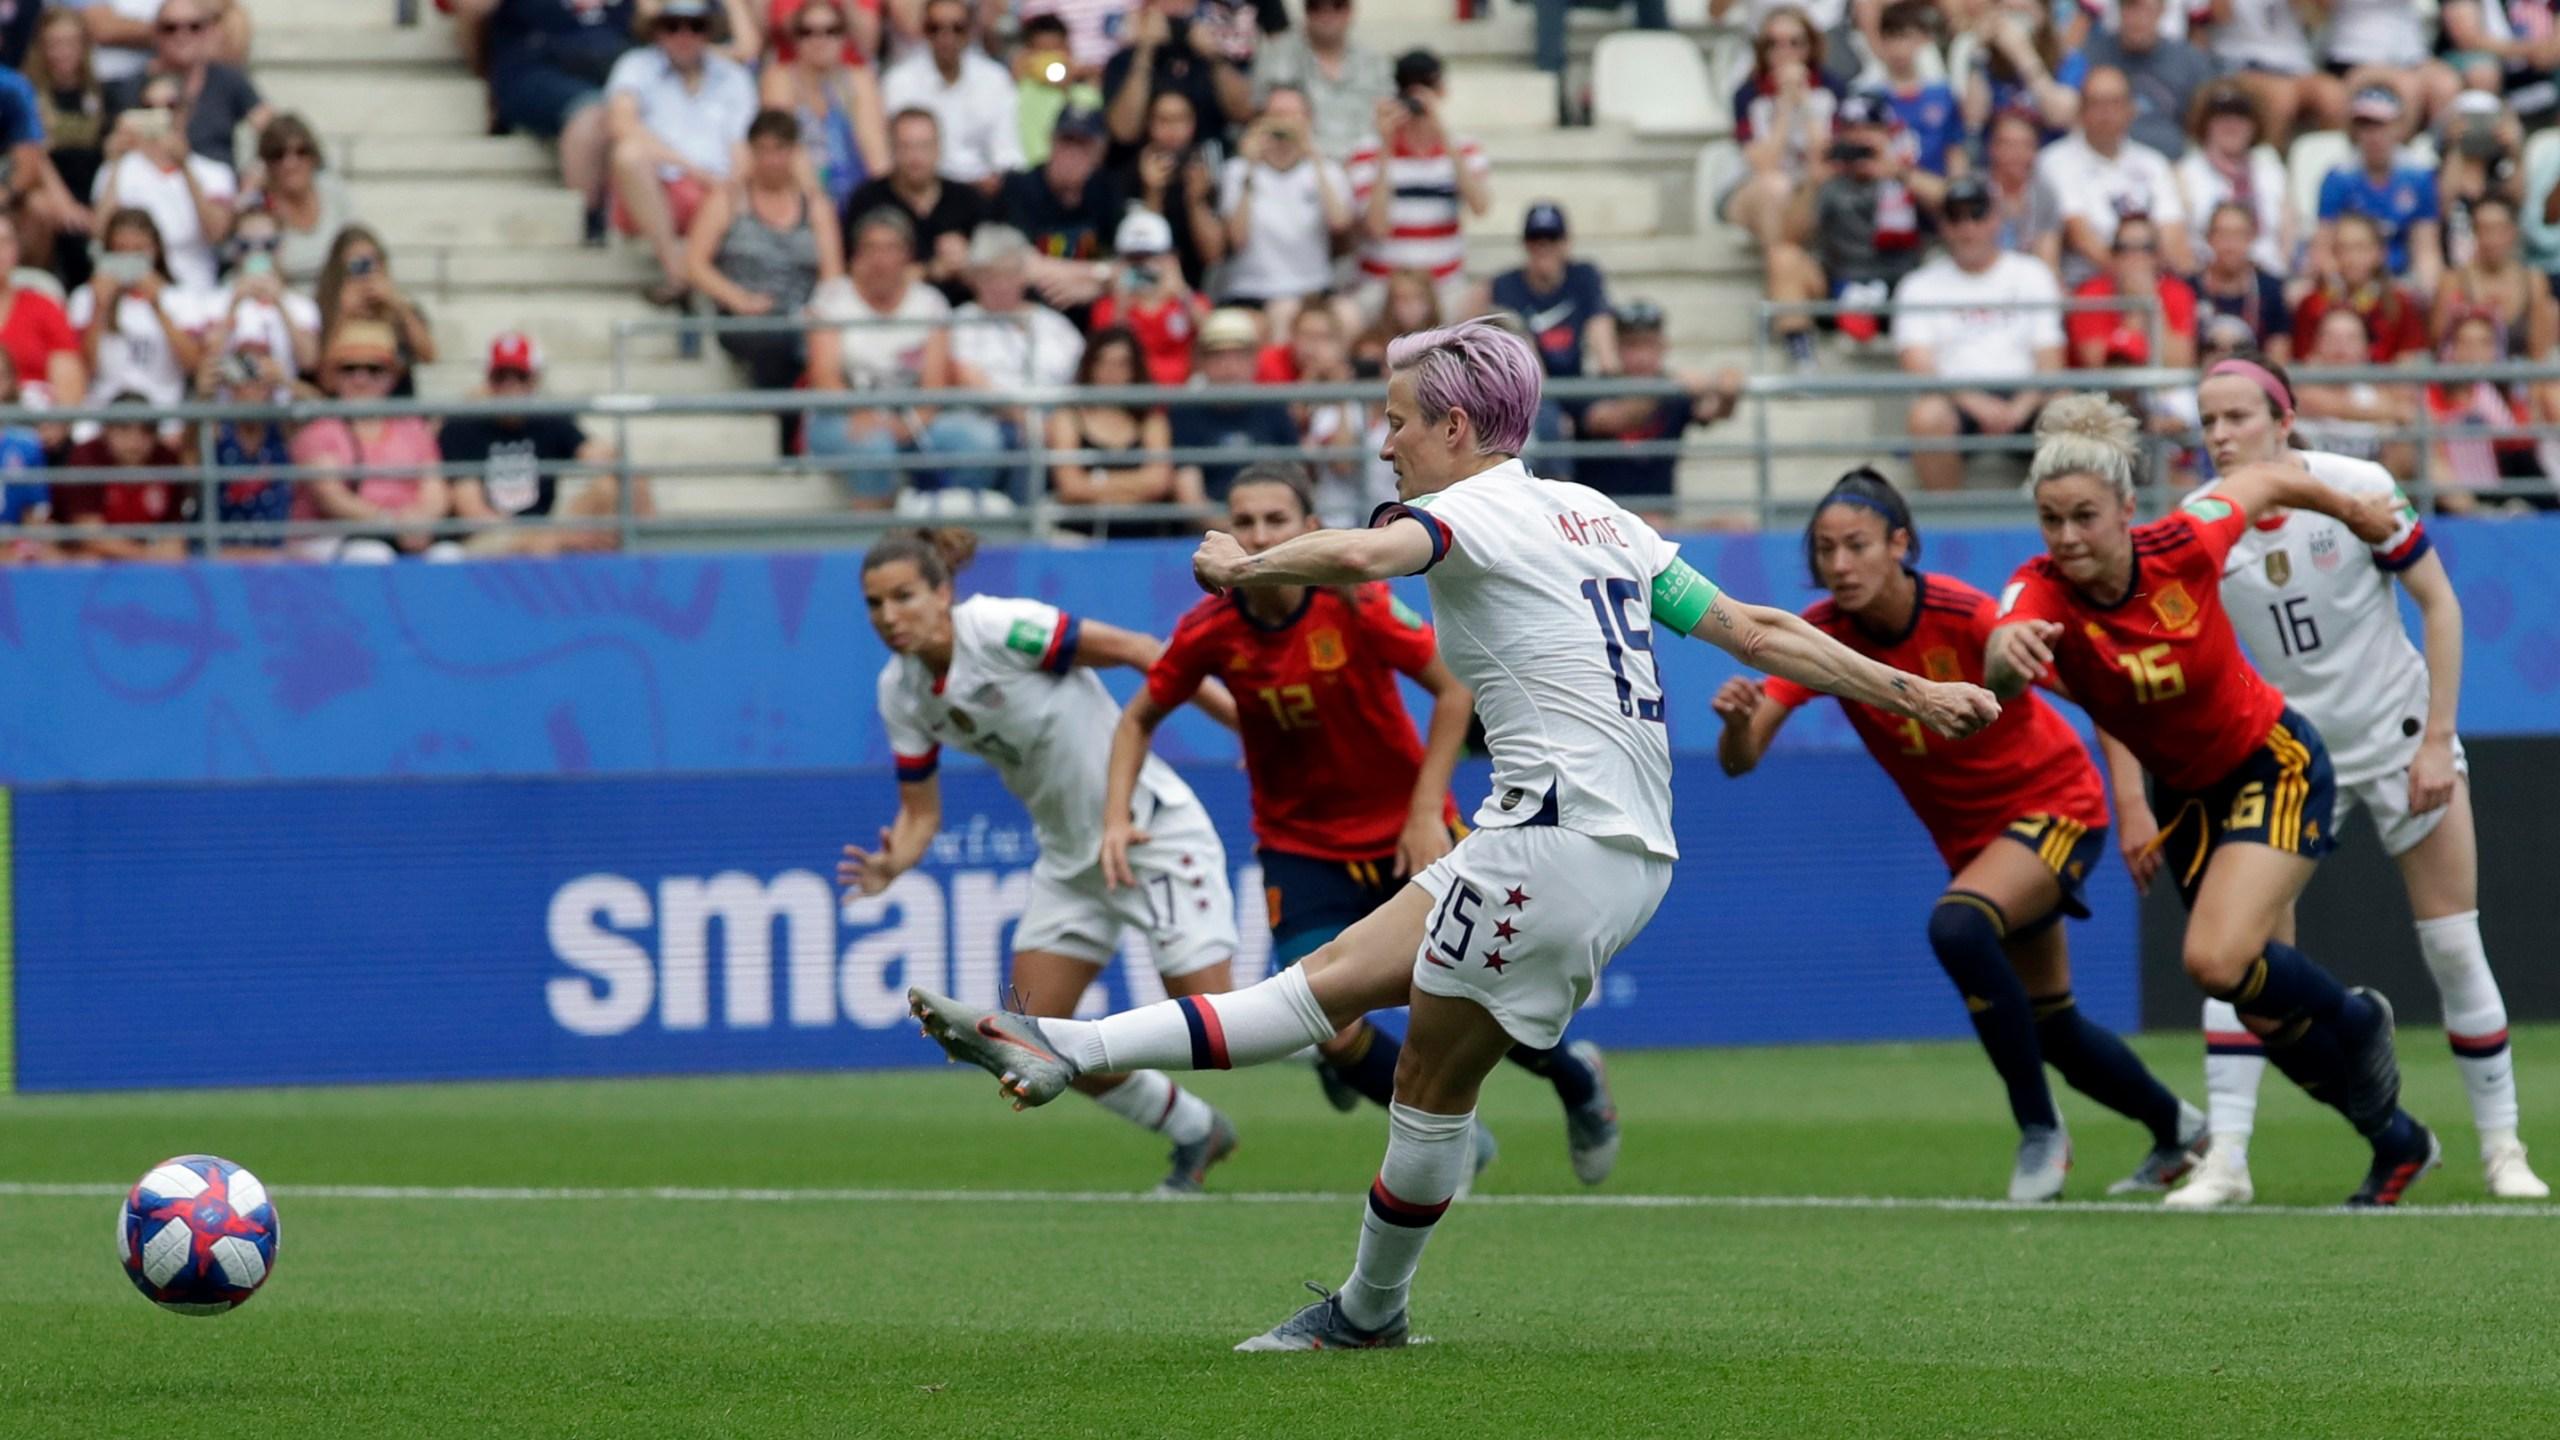 France_Spain_US_WWCup_Soccer_56288-159532.jpg67337303